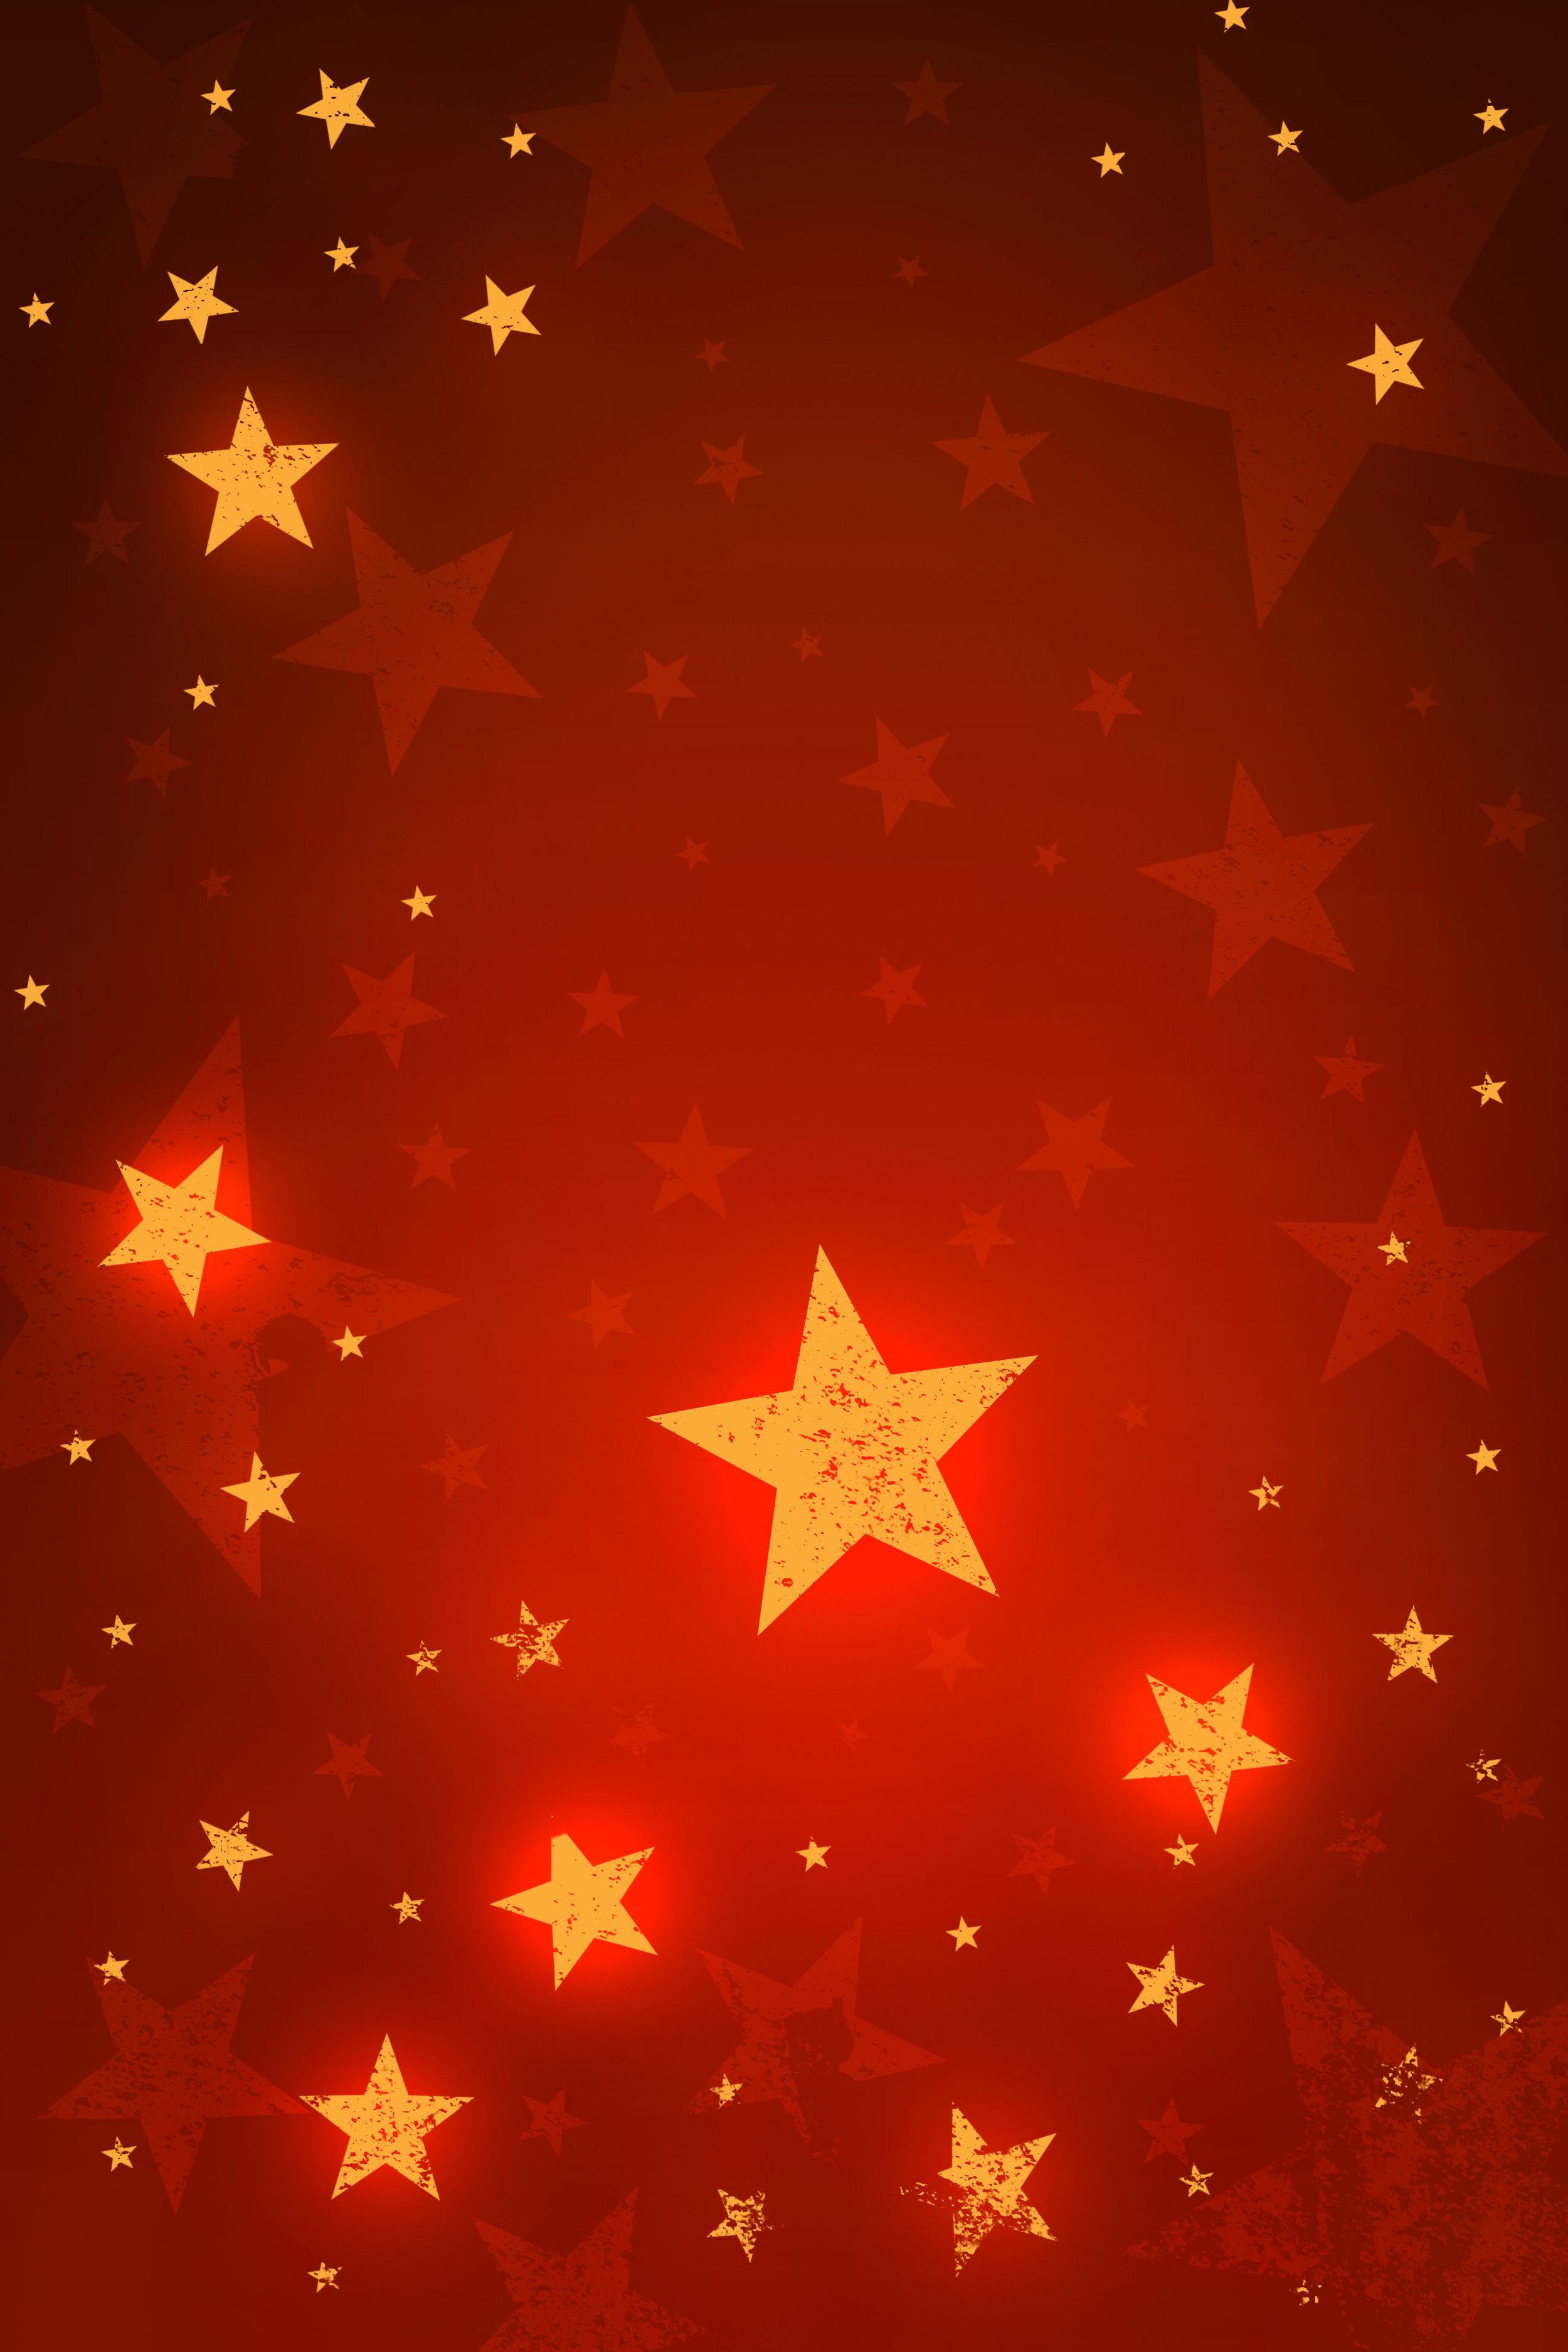 stars_red.jpg